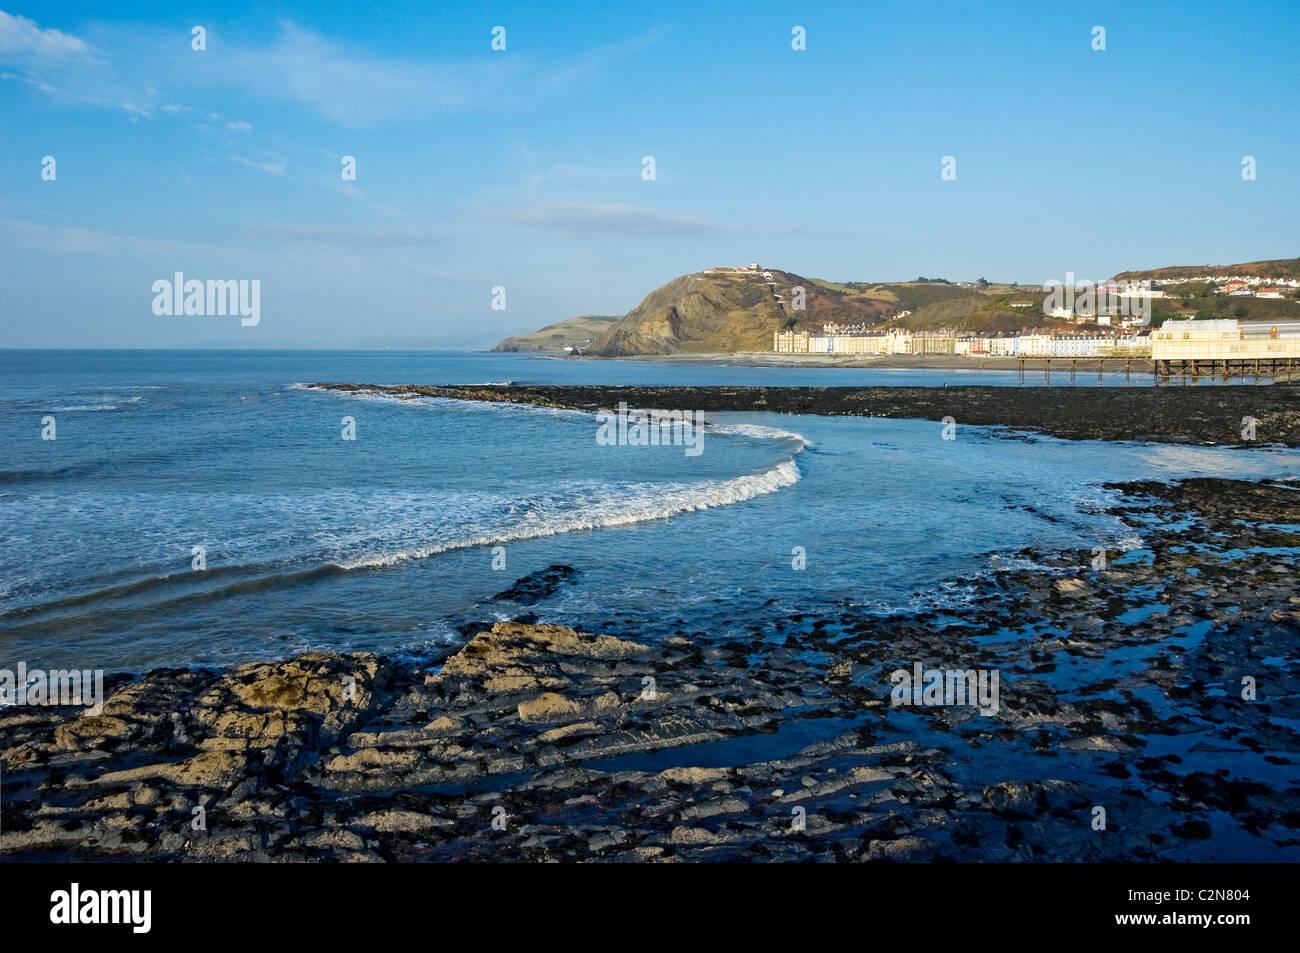 North Beach Aberystwyth Cardiganshire mid Wales UK United Kingdom GB Great Britain - Stock Image